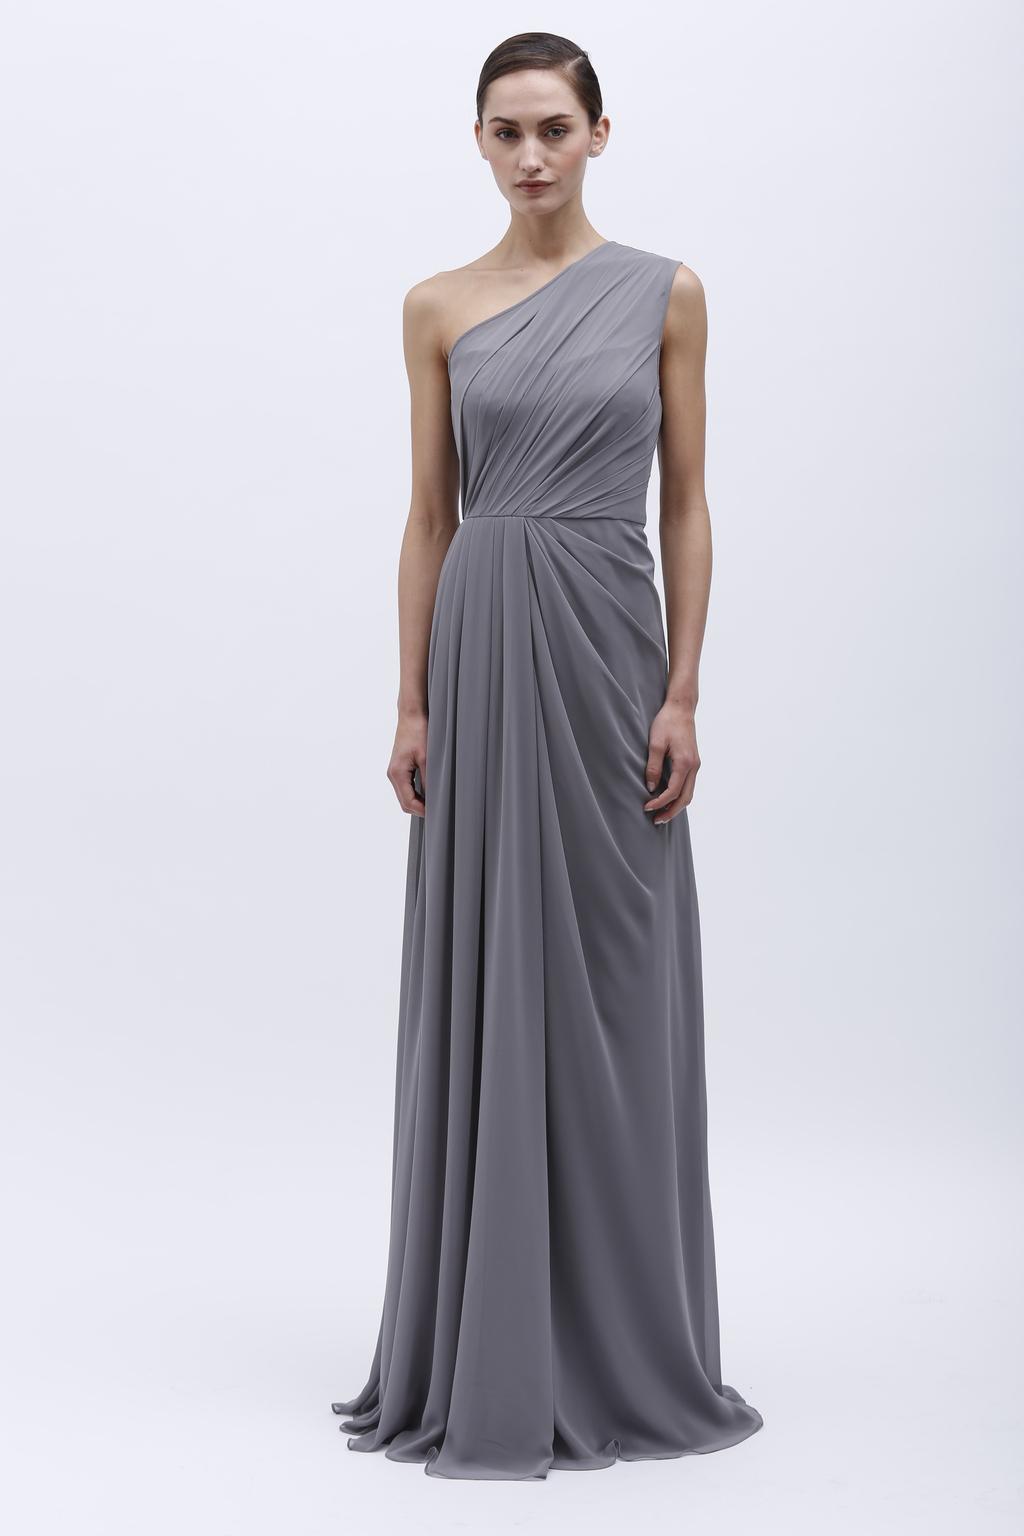 Monique-lhuillier-spring-2014-bridesmaid-dress-0450134_slate.full